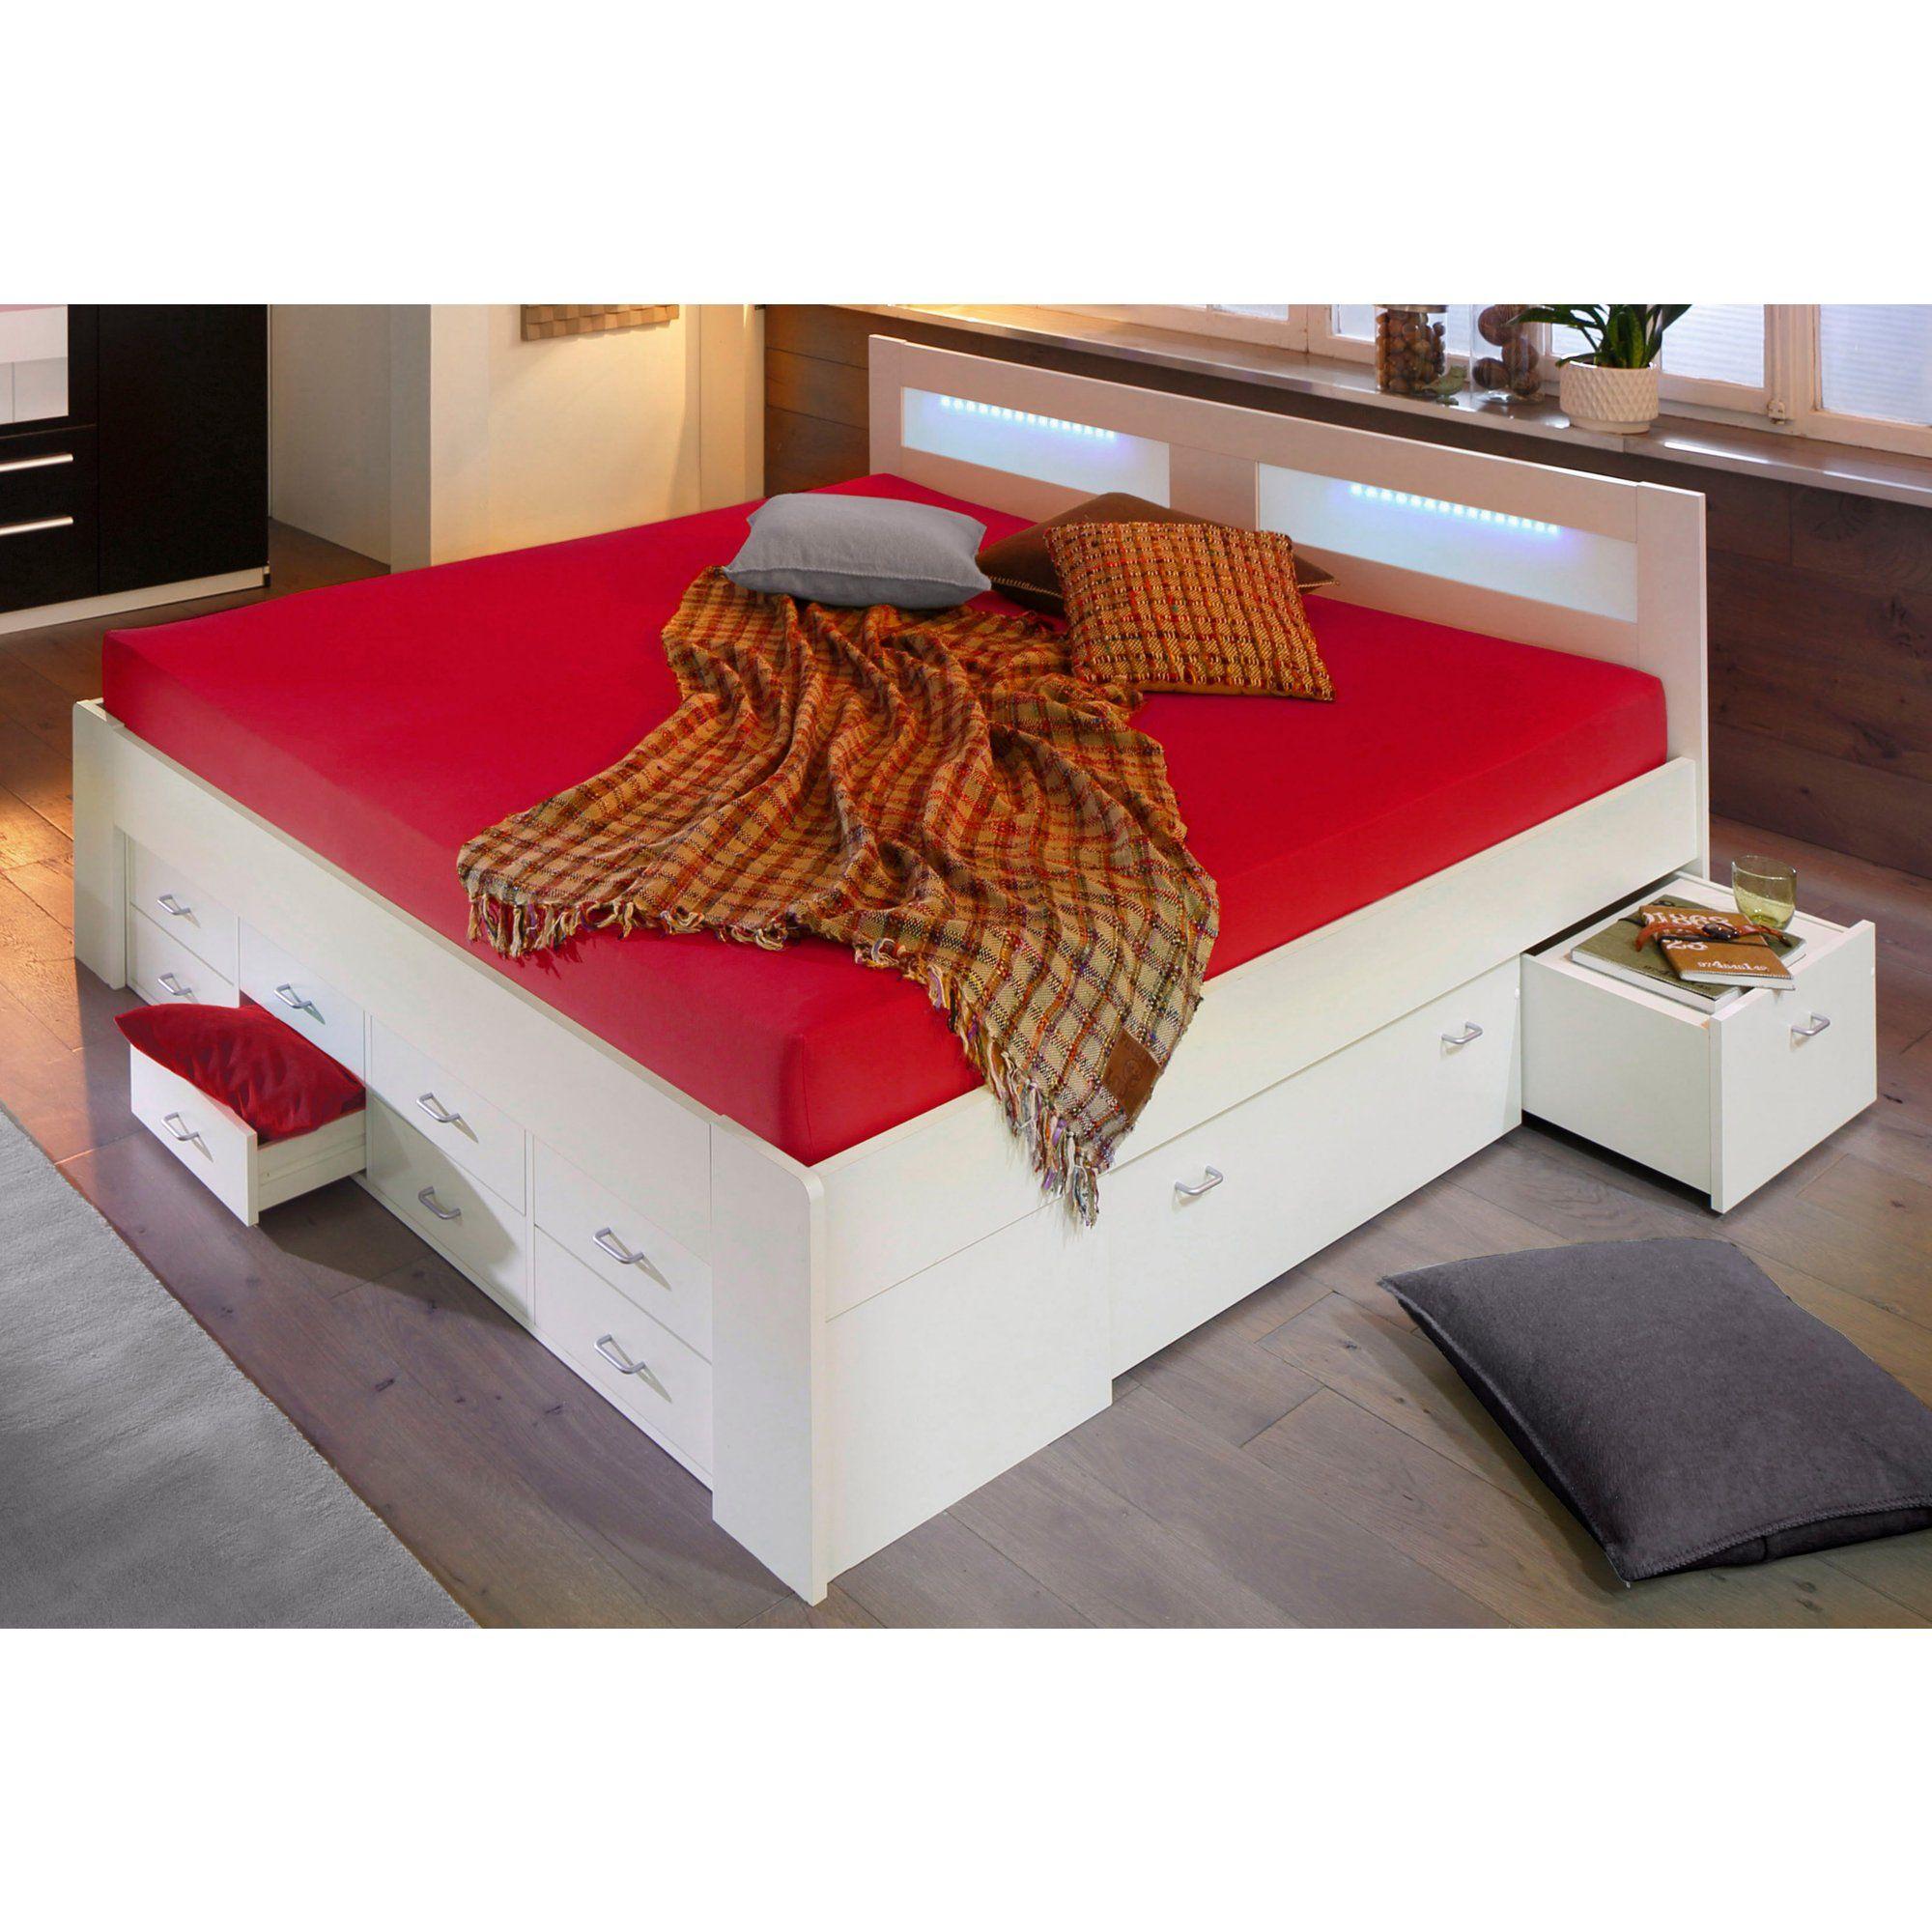 Lit 1 2 Personnes Multi Rangements Sommier Matelas Ressorts 3 Largeurs 3suisses Furniture Bed Comfy Bedroom